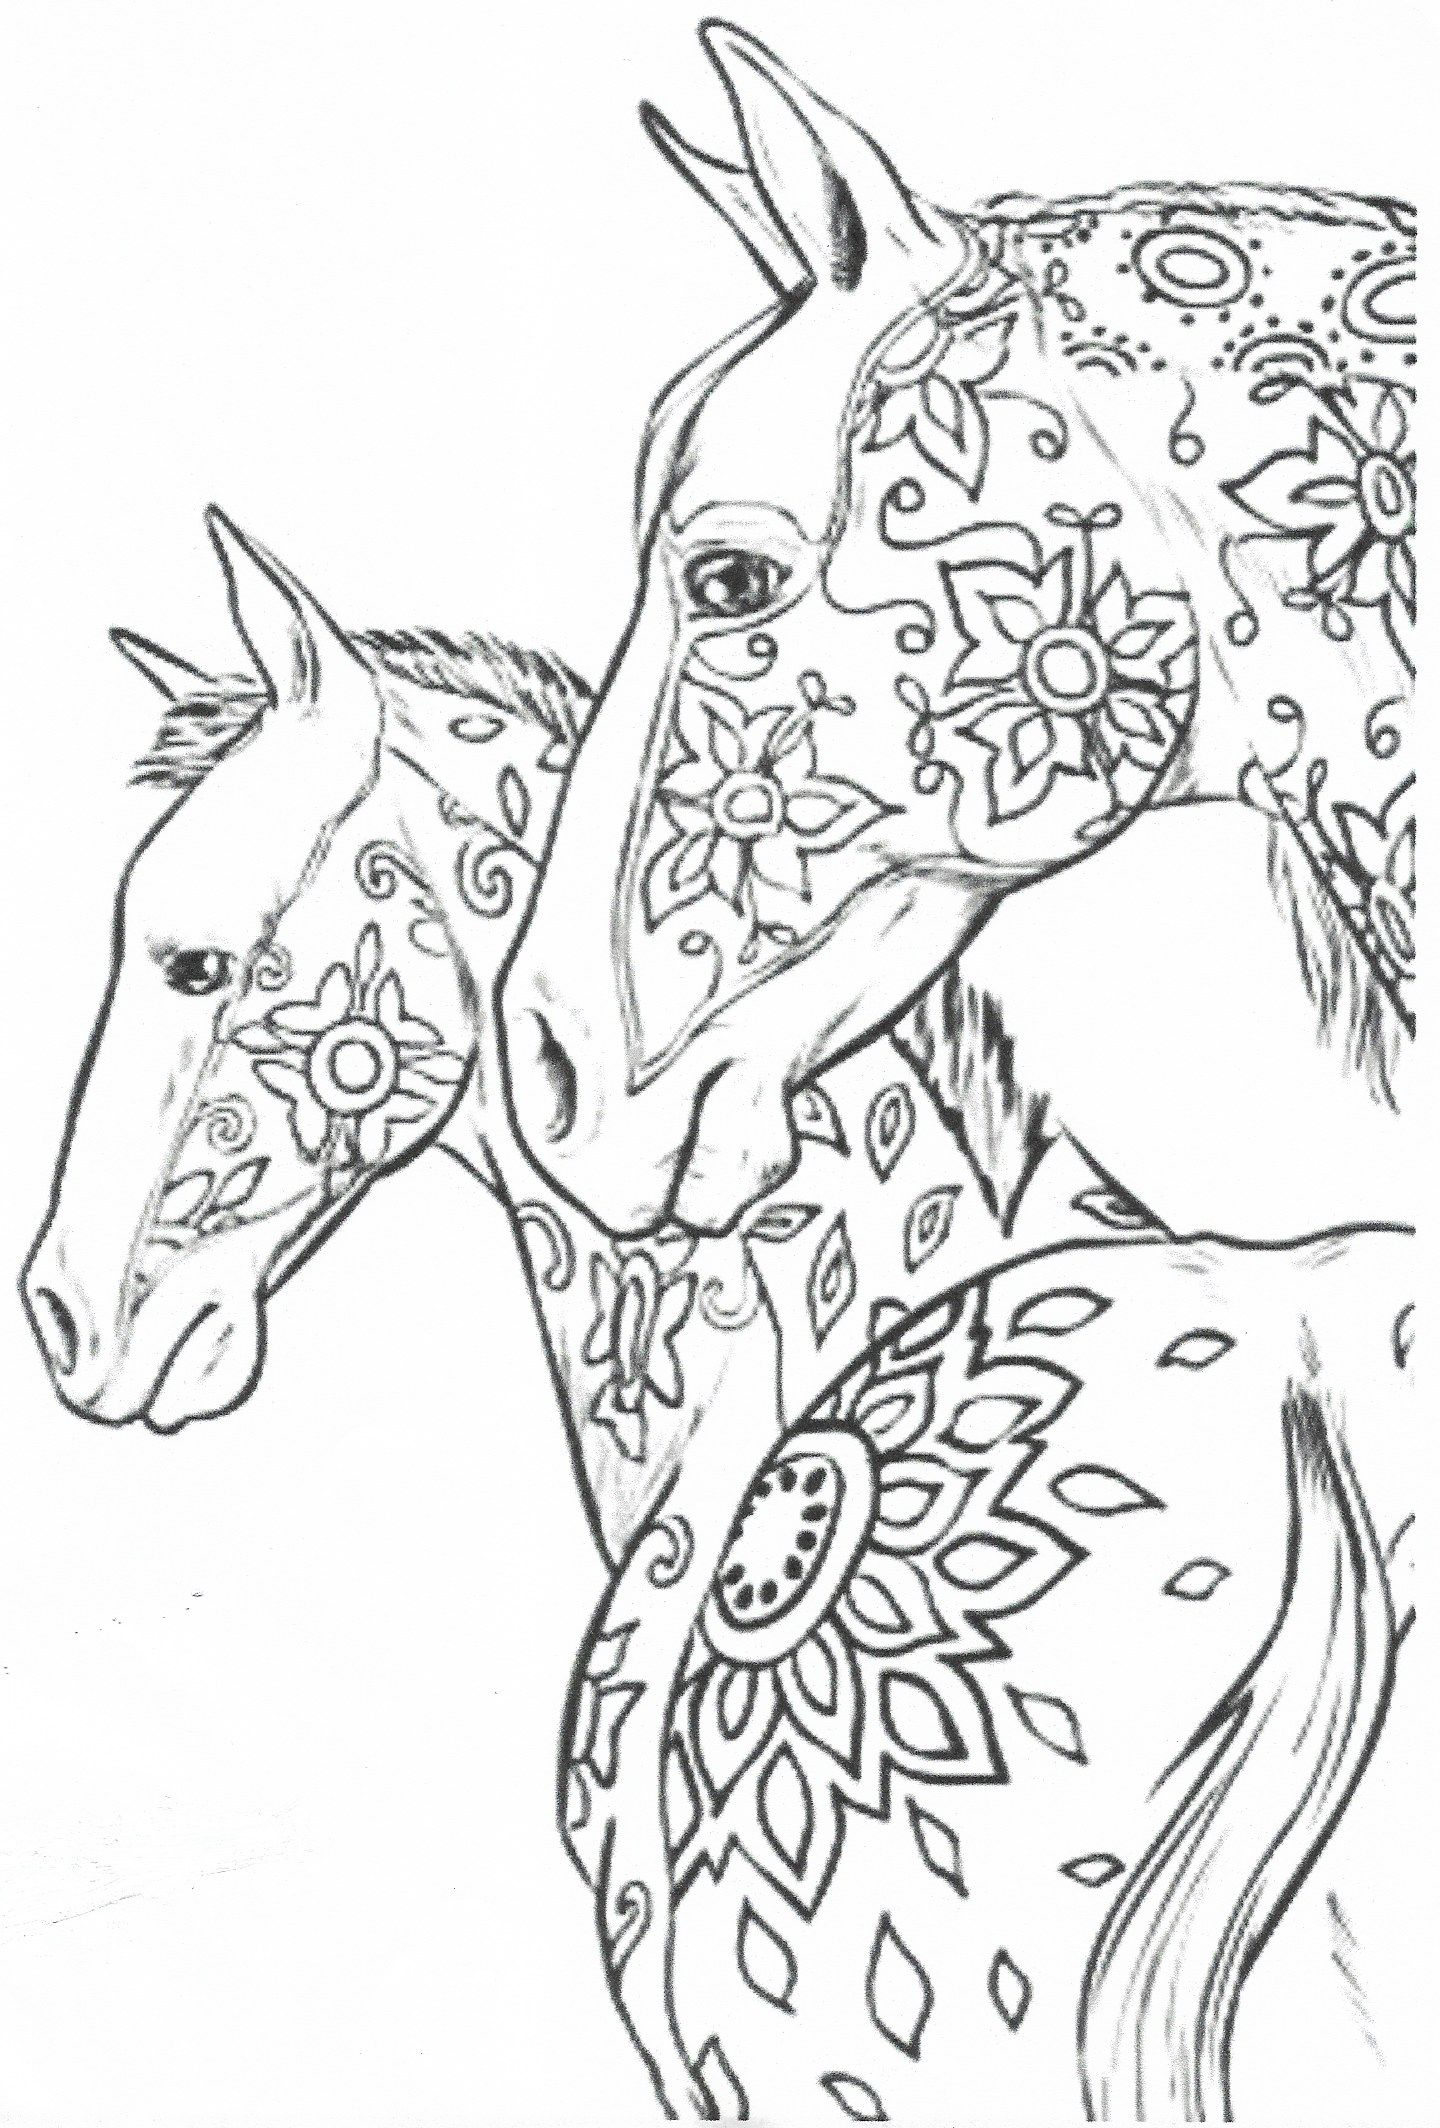 Pin von Wanda Twellman auf Coloring Horses | Pinterest